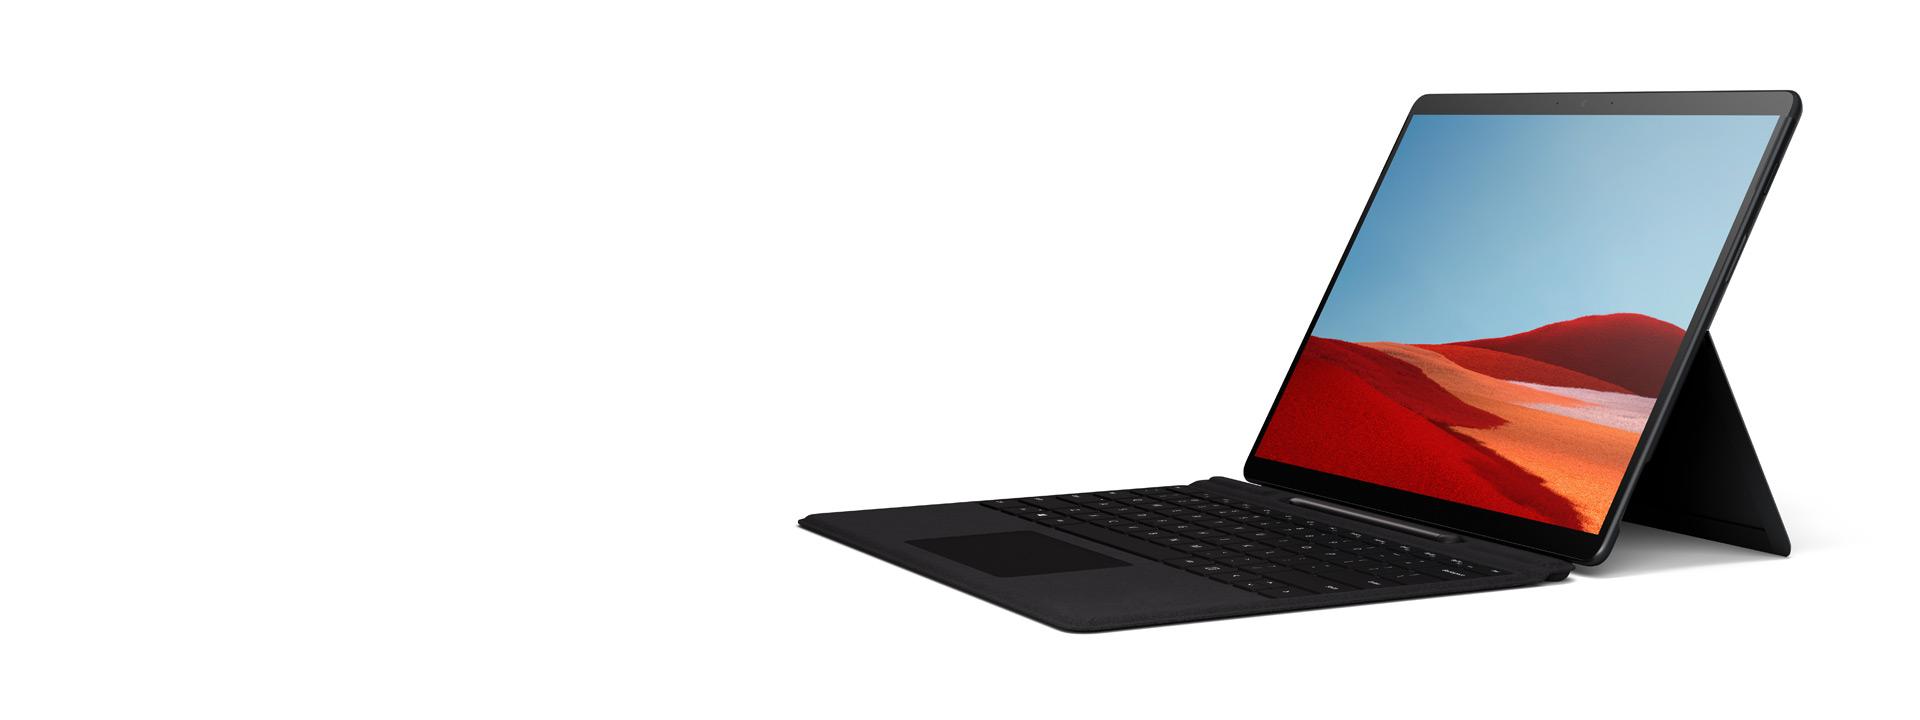 Surface Pro X met 13inch PixelSense™-scherm